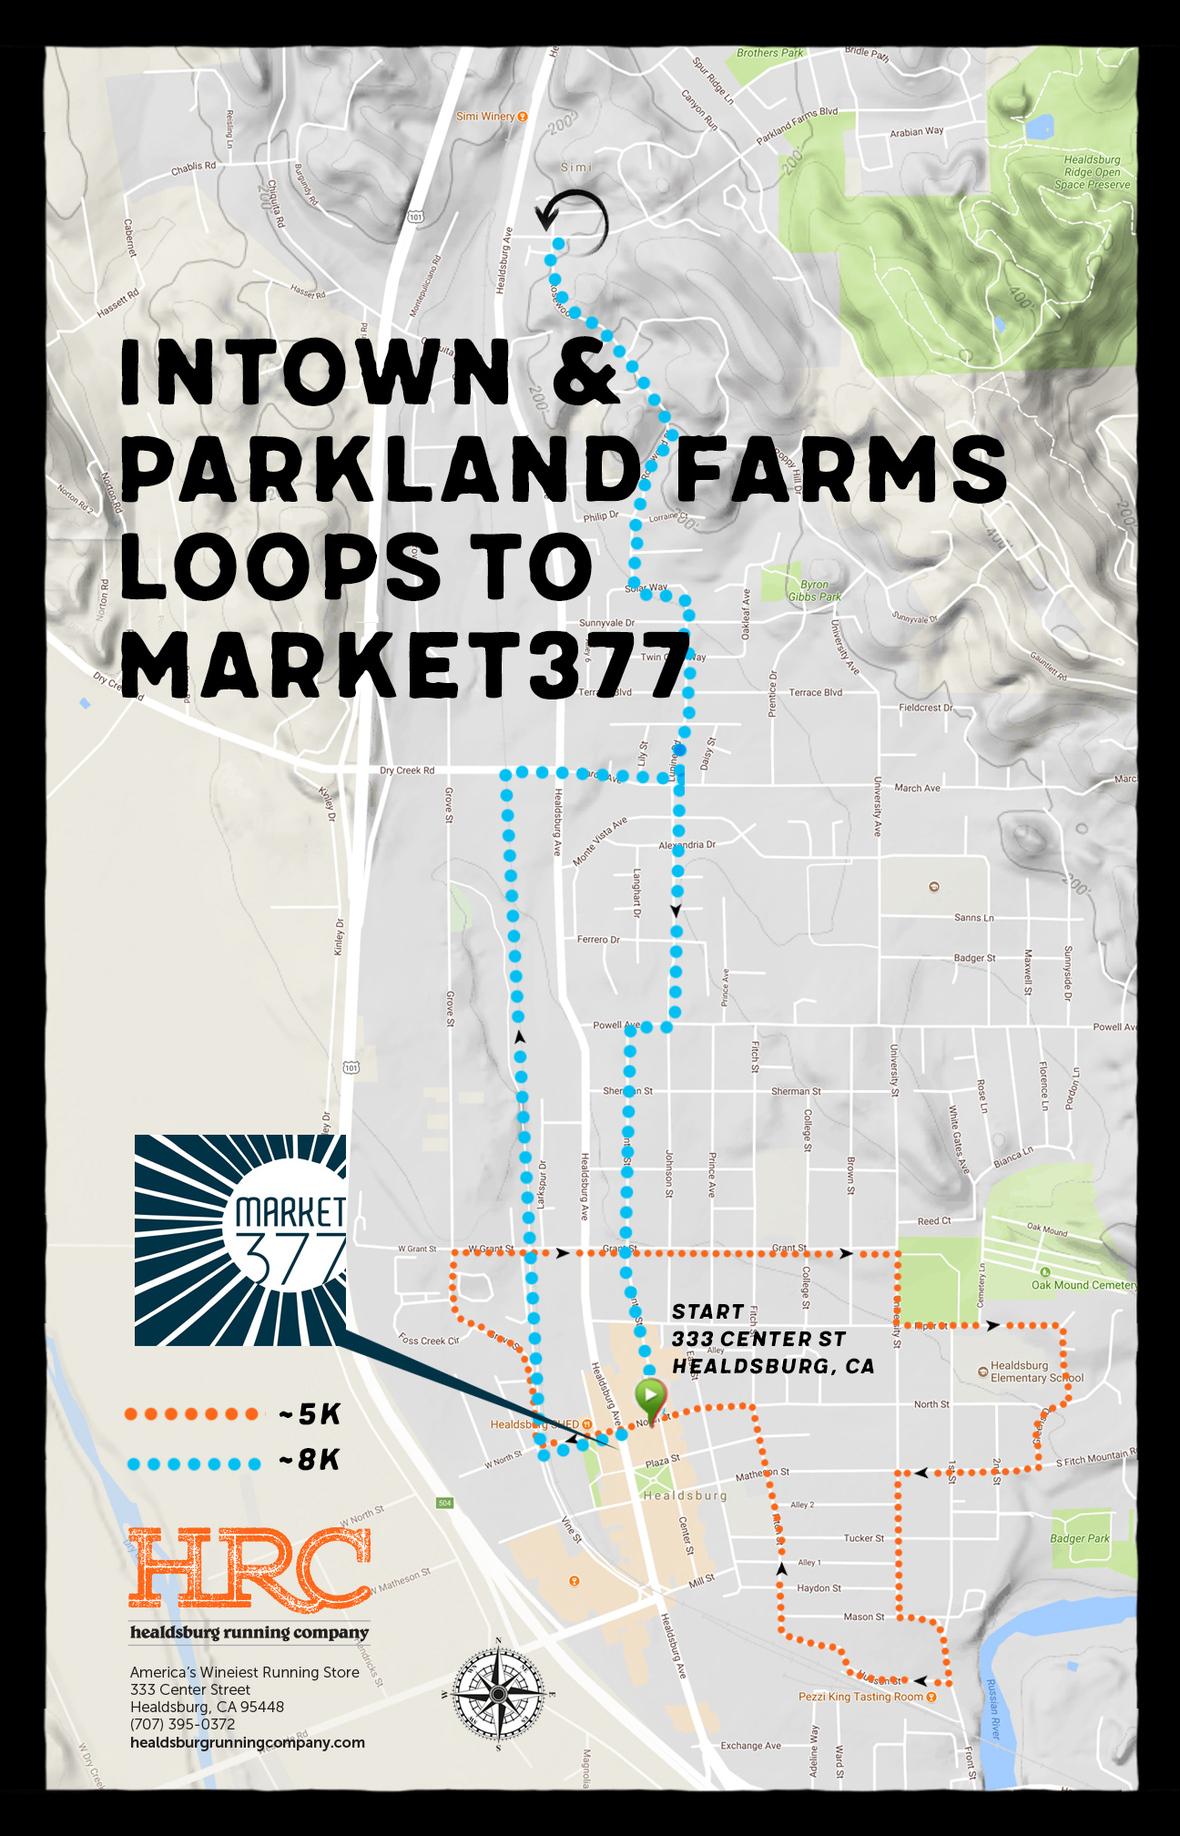 market377 with parkland farms